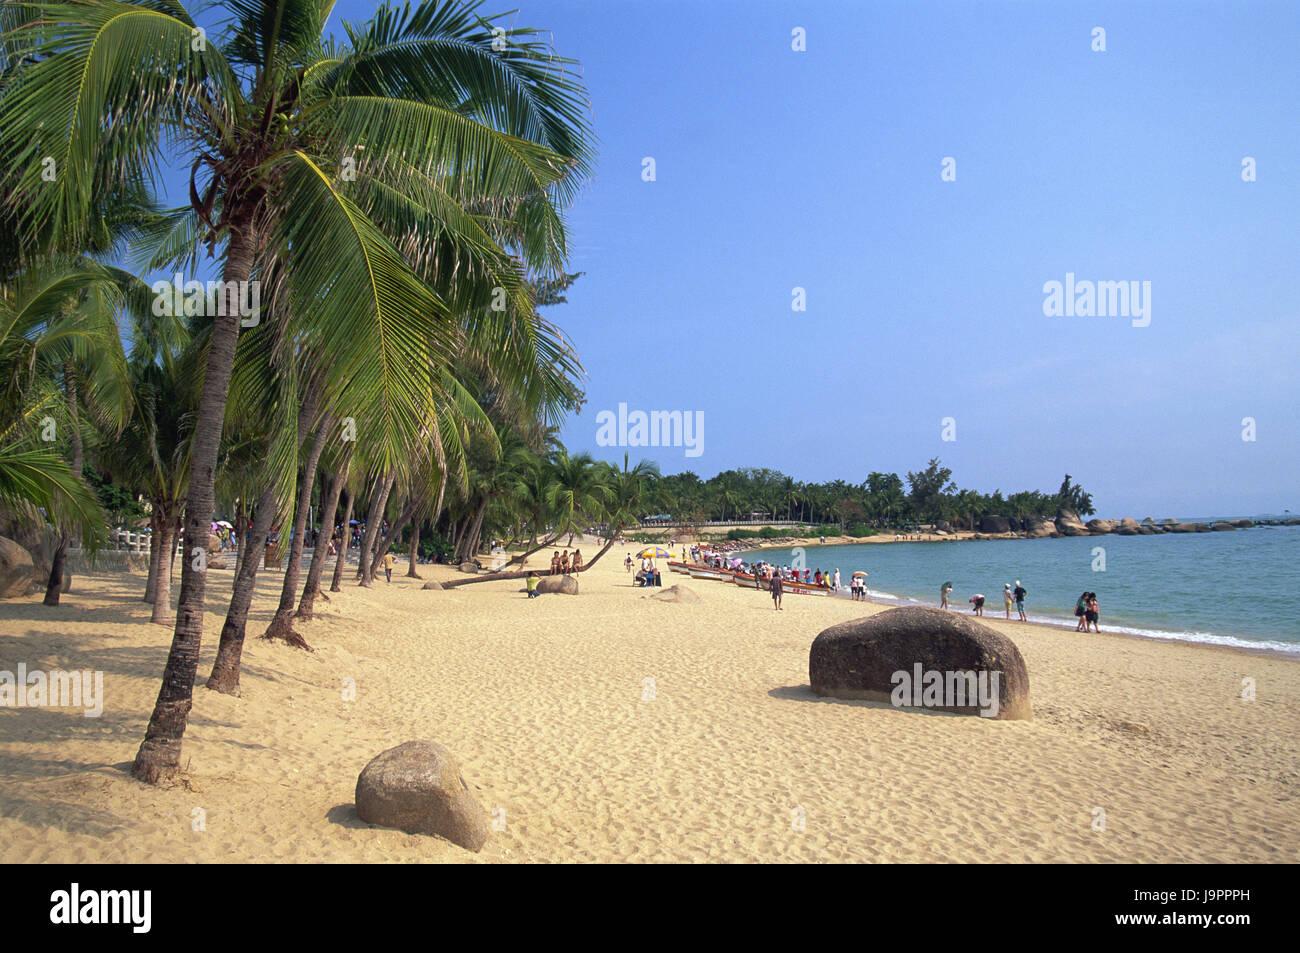 China,Hainan Iceland,Sanya,sandy beach,rock,palms,tourists,Asia,Eastern Asia,destination,beach,vacation,tourism,beach - Stock Image